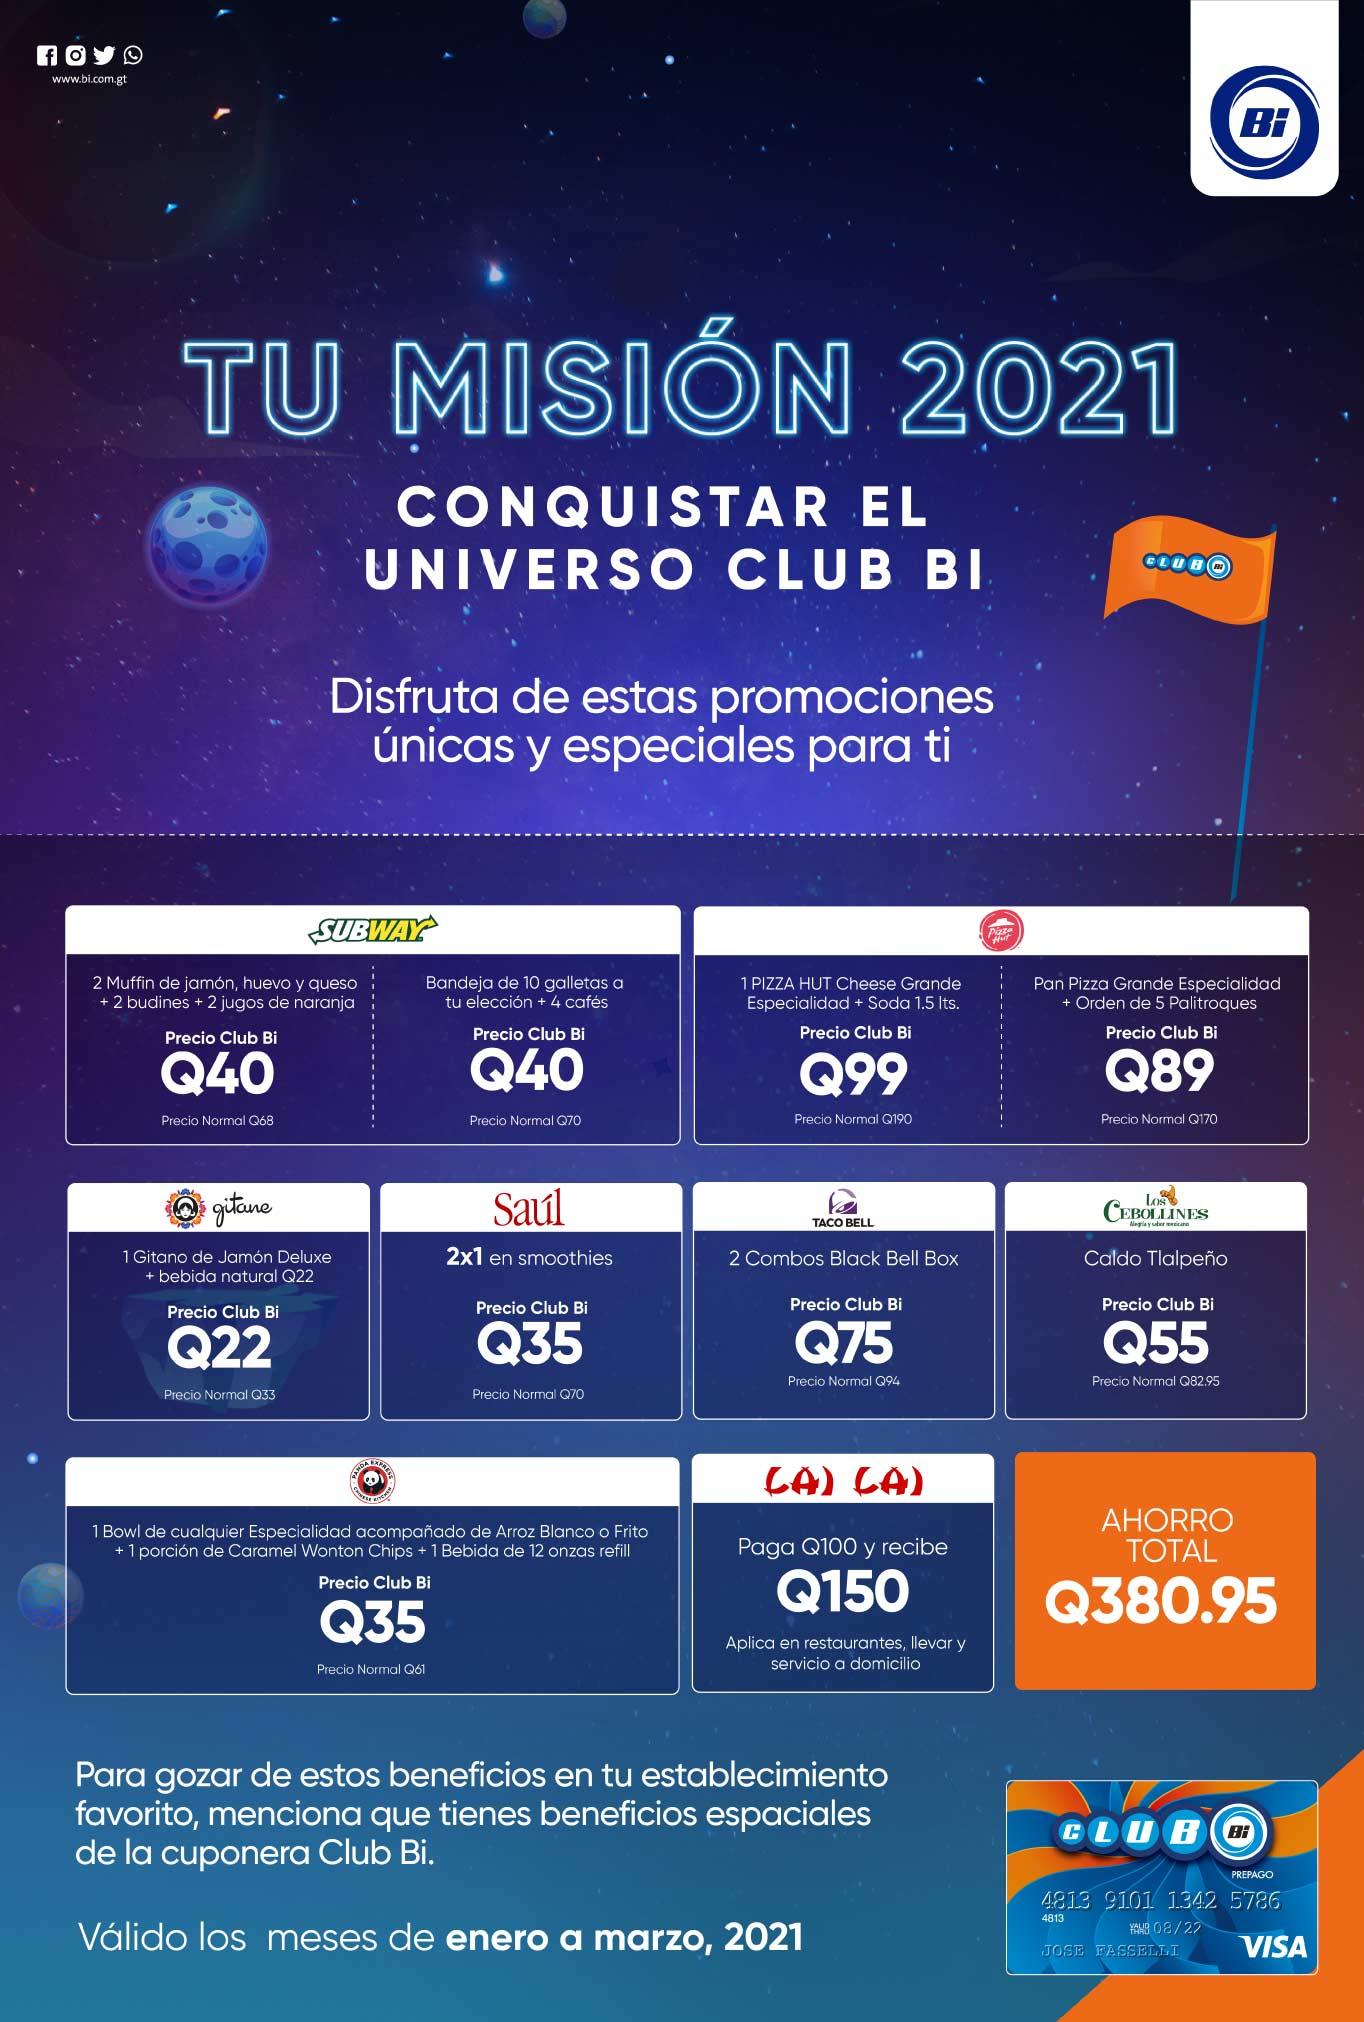 Mision-2021-club-bi2